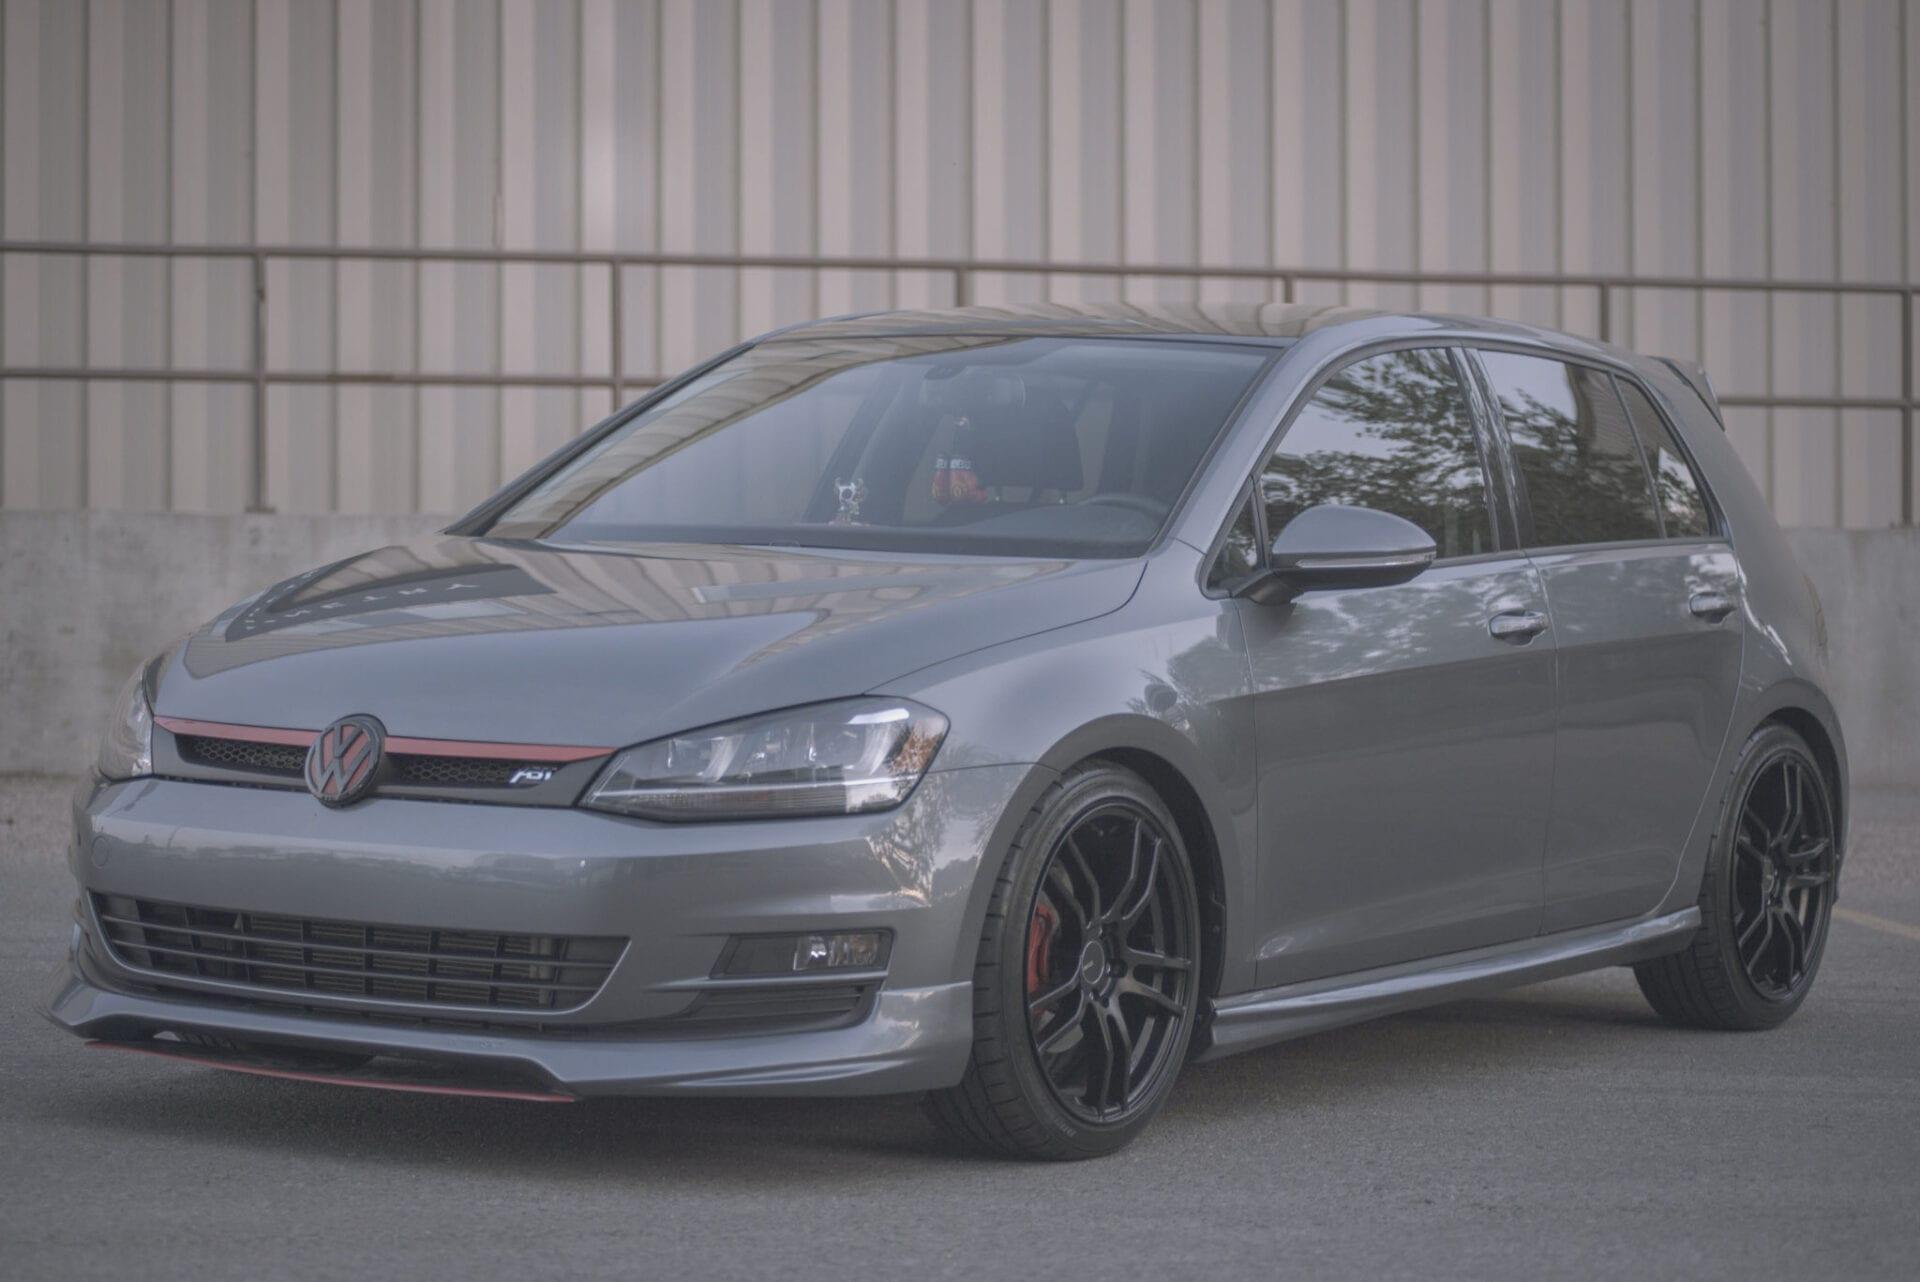 Automotive car shoot in Edmonton